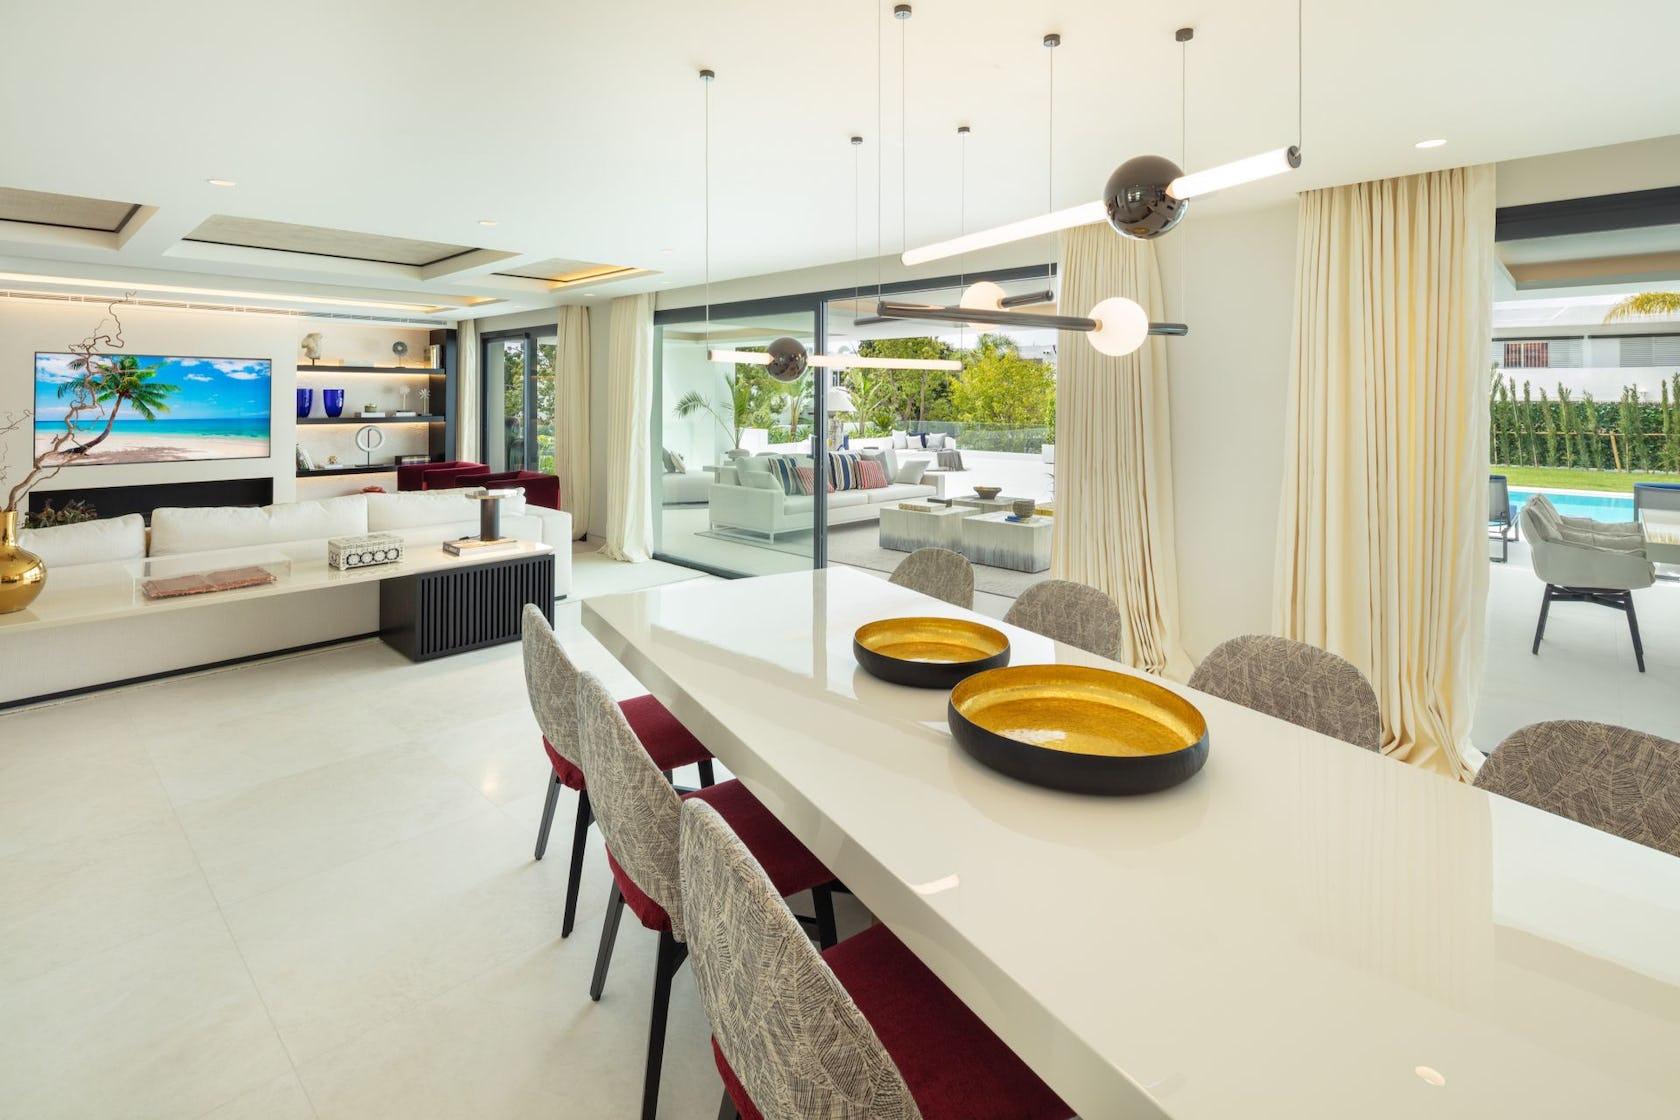 interior design indoors living room room chair furniture home decor flooring housing